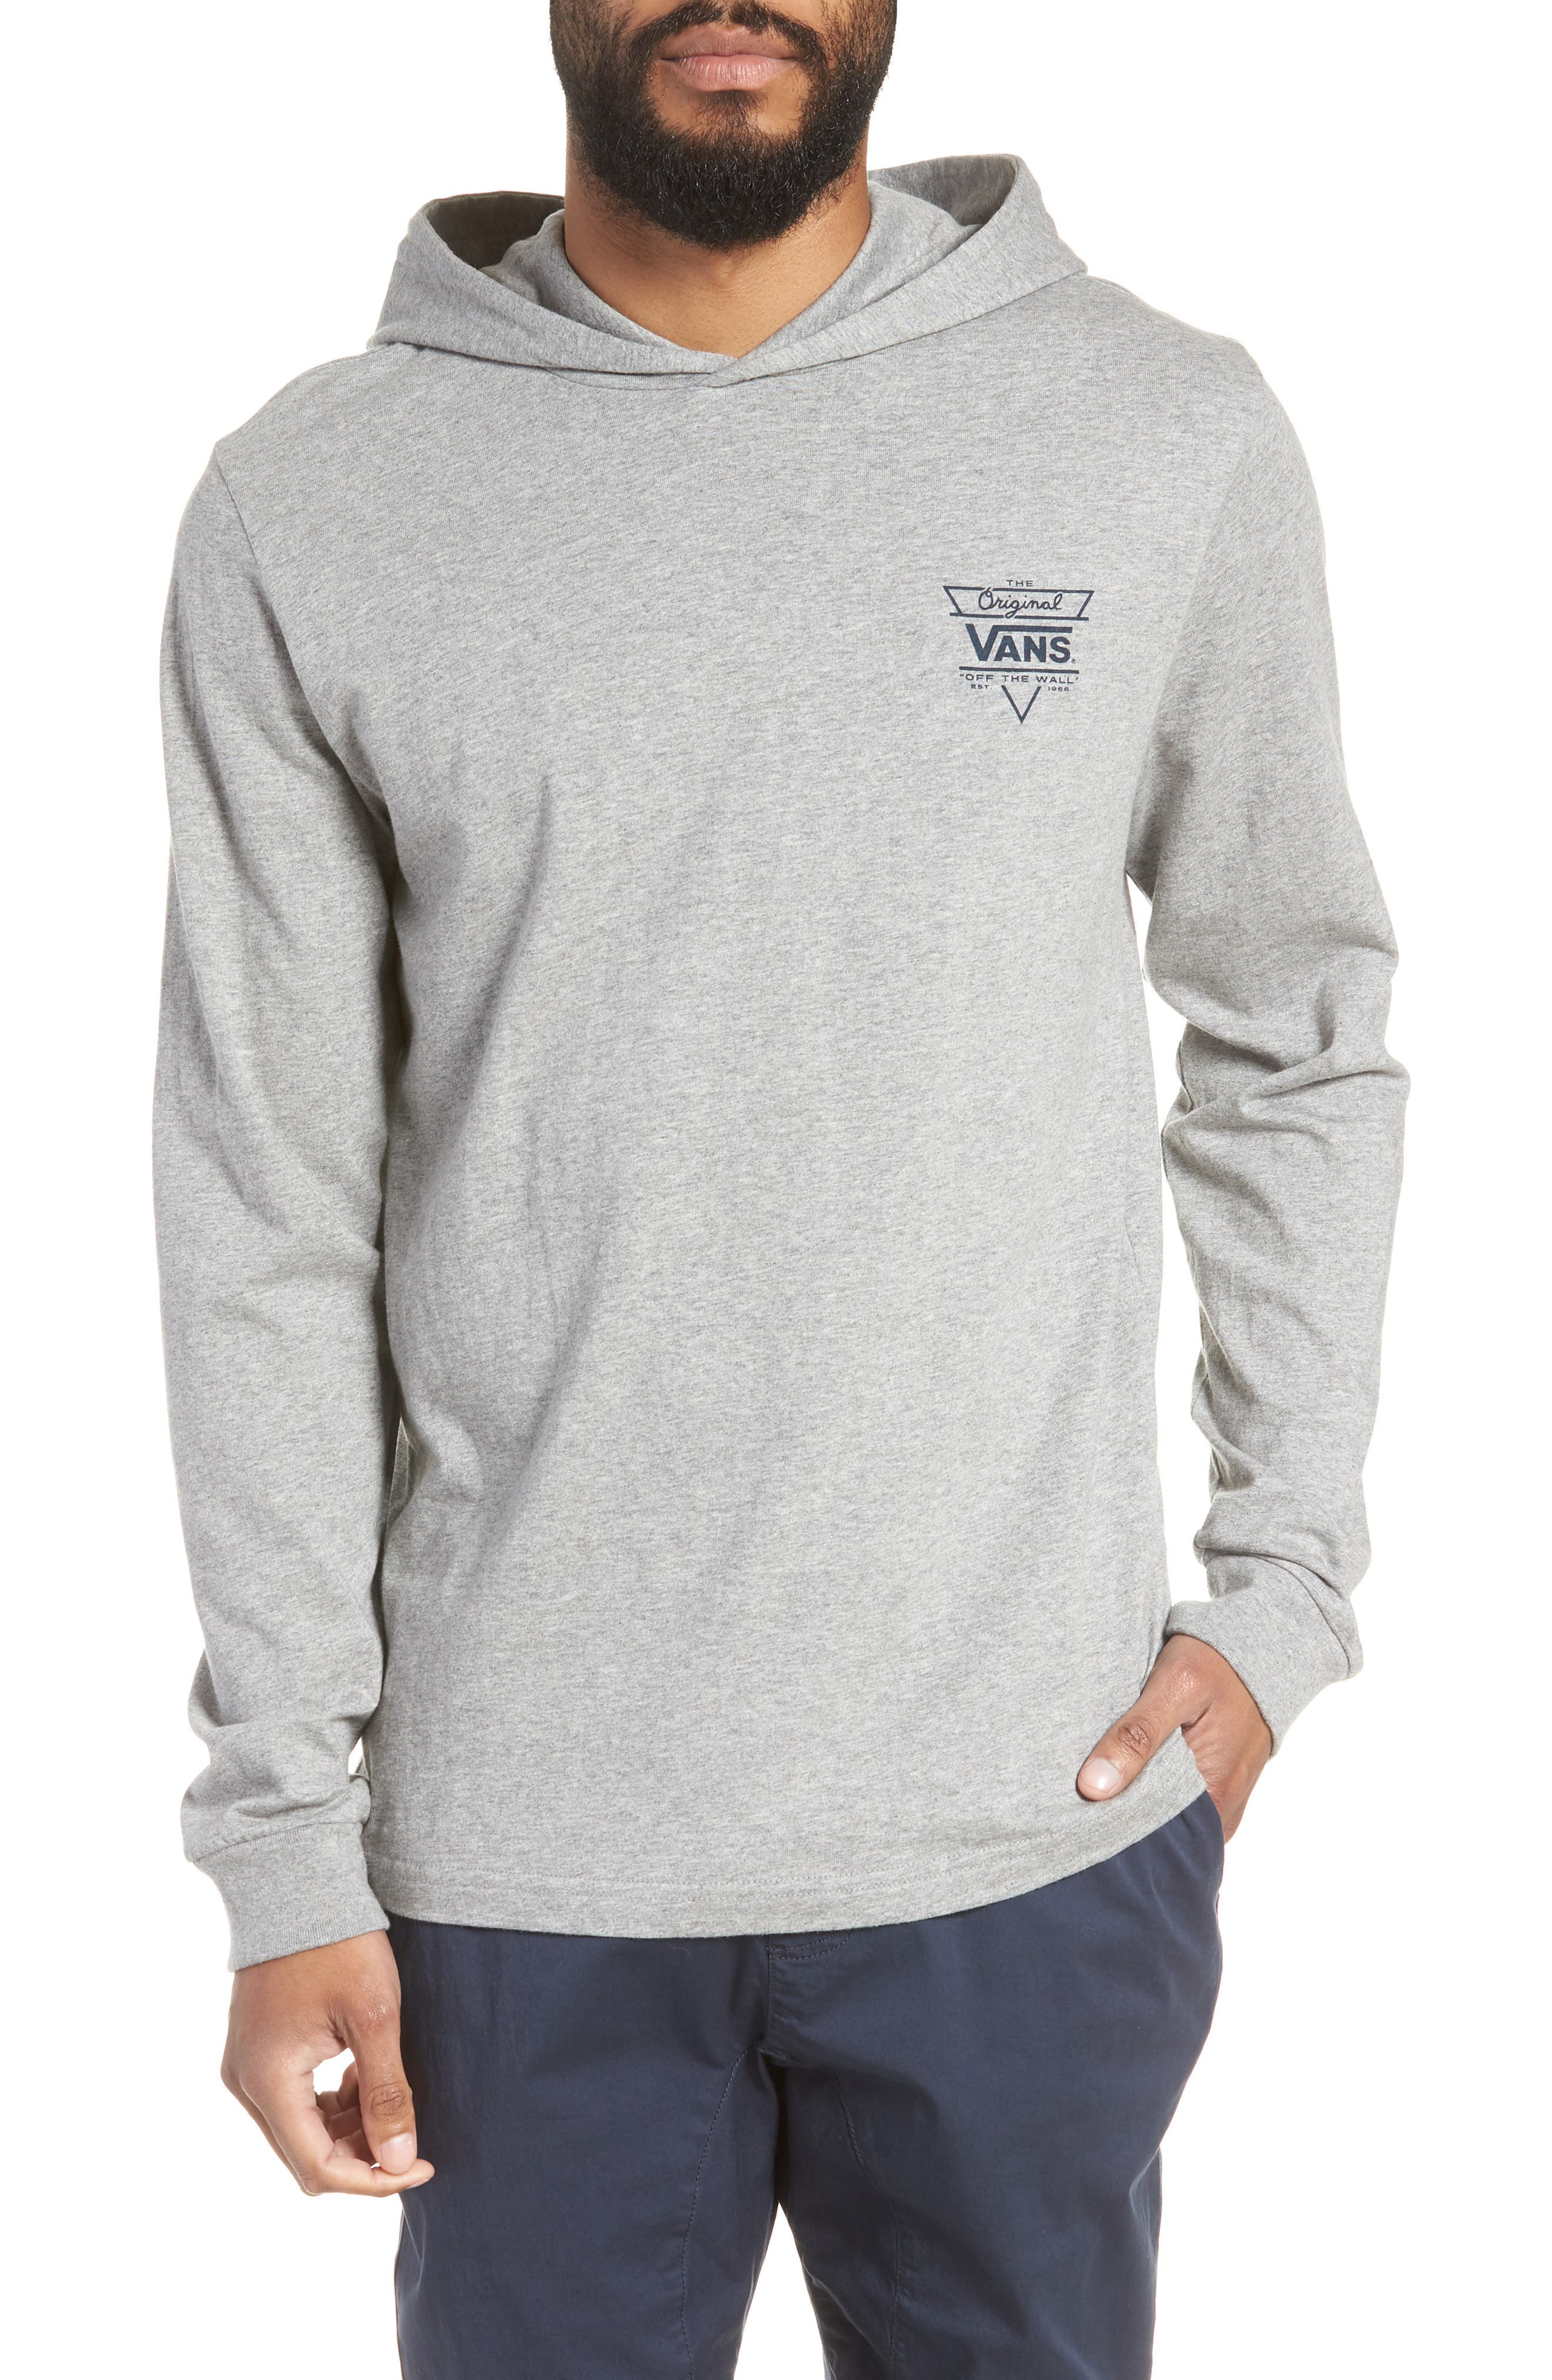 Van Doren Hooded T-Shirt,                             Main thumbnail 1, color,                             030